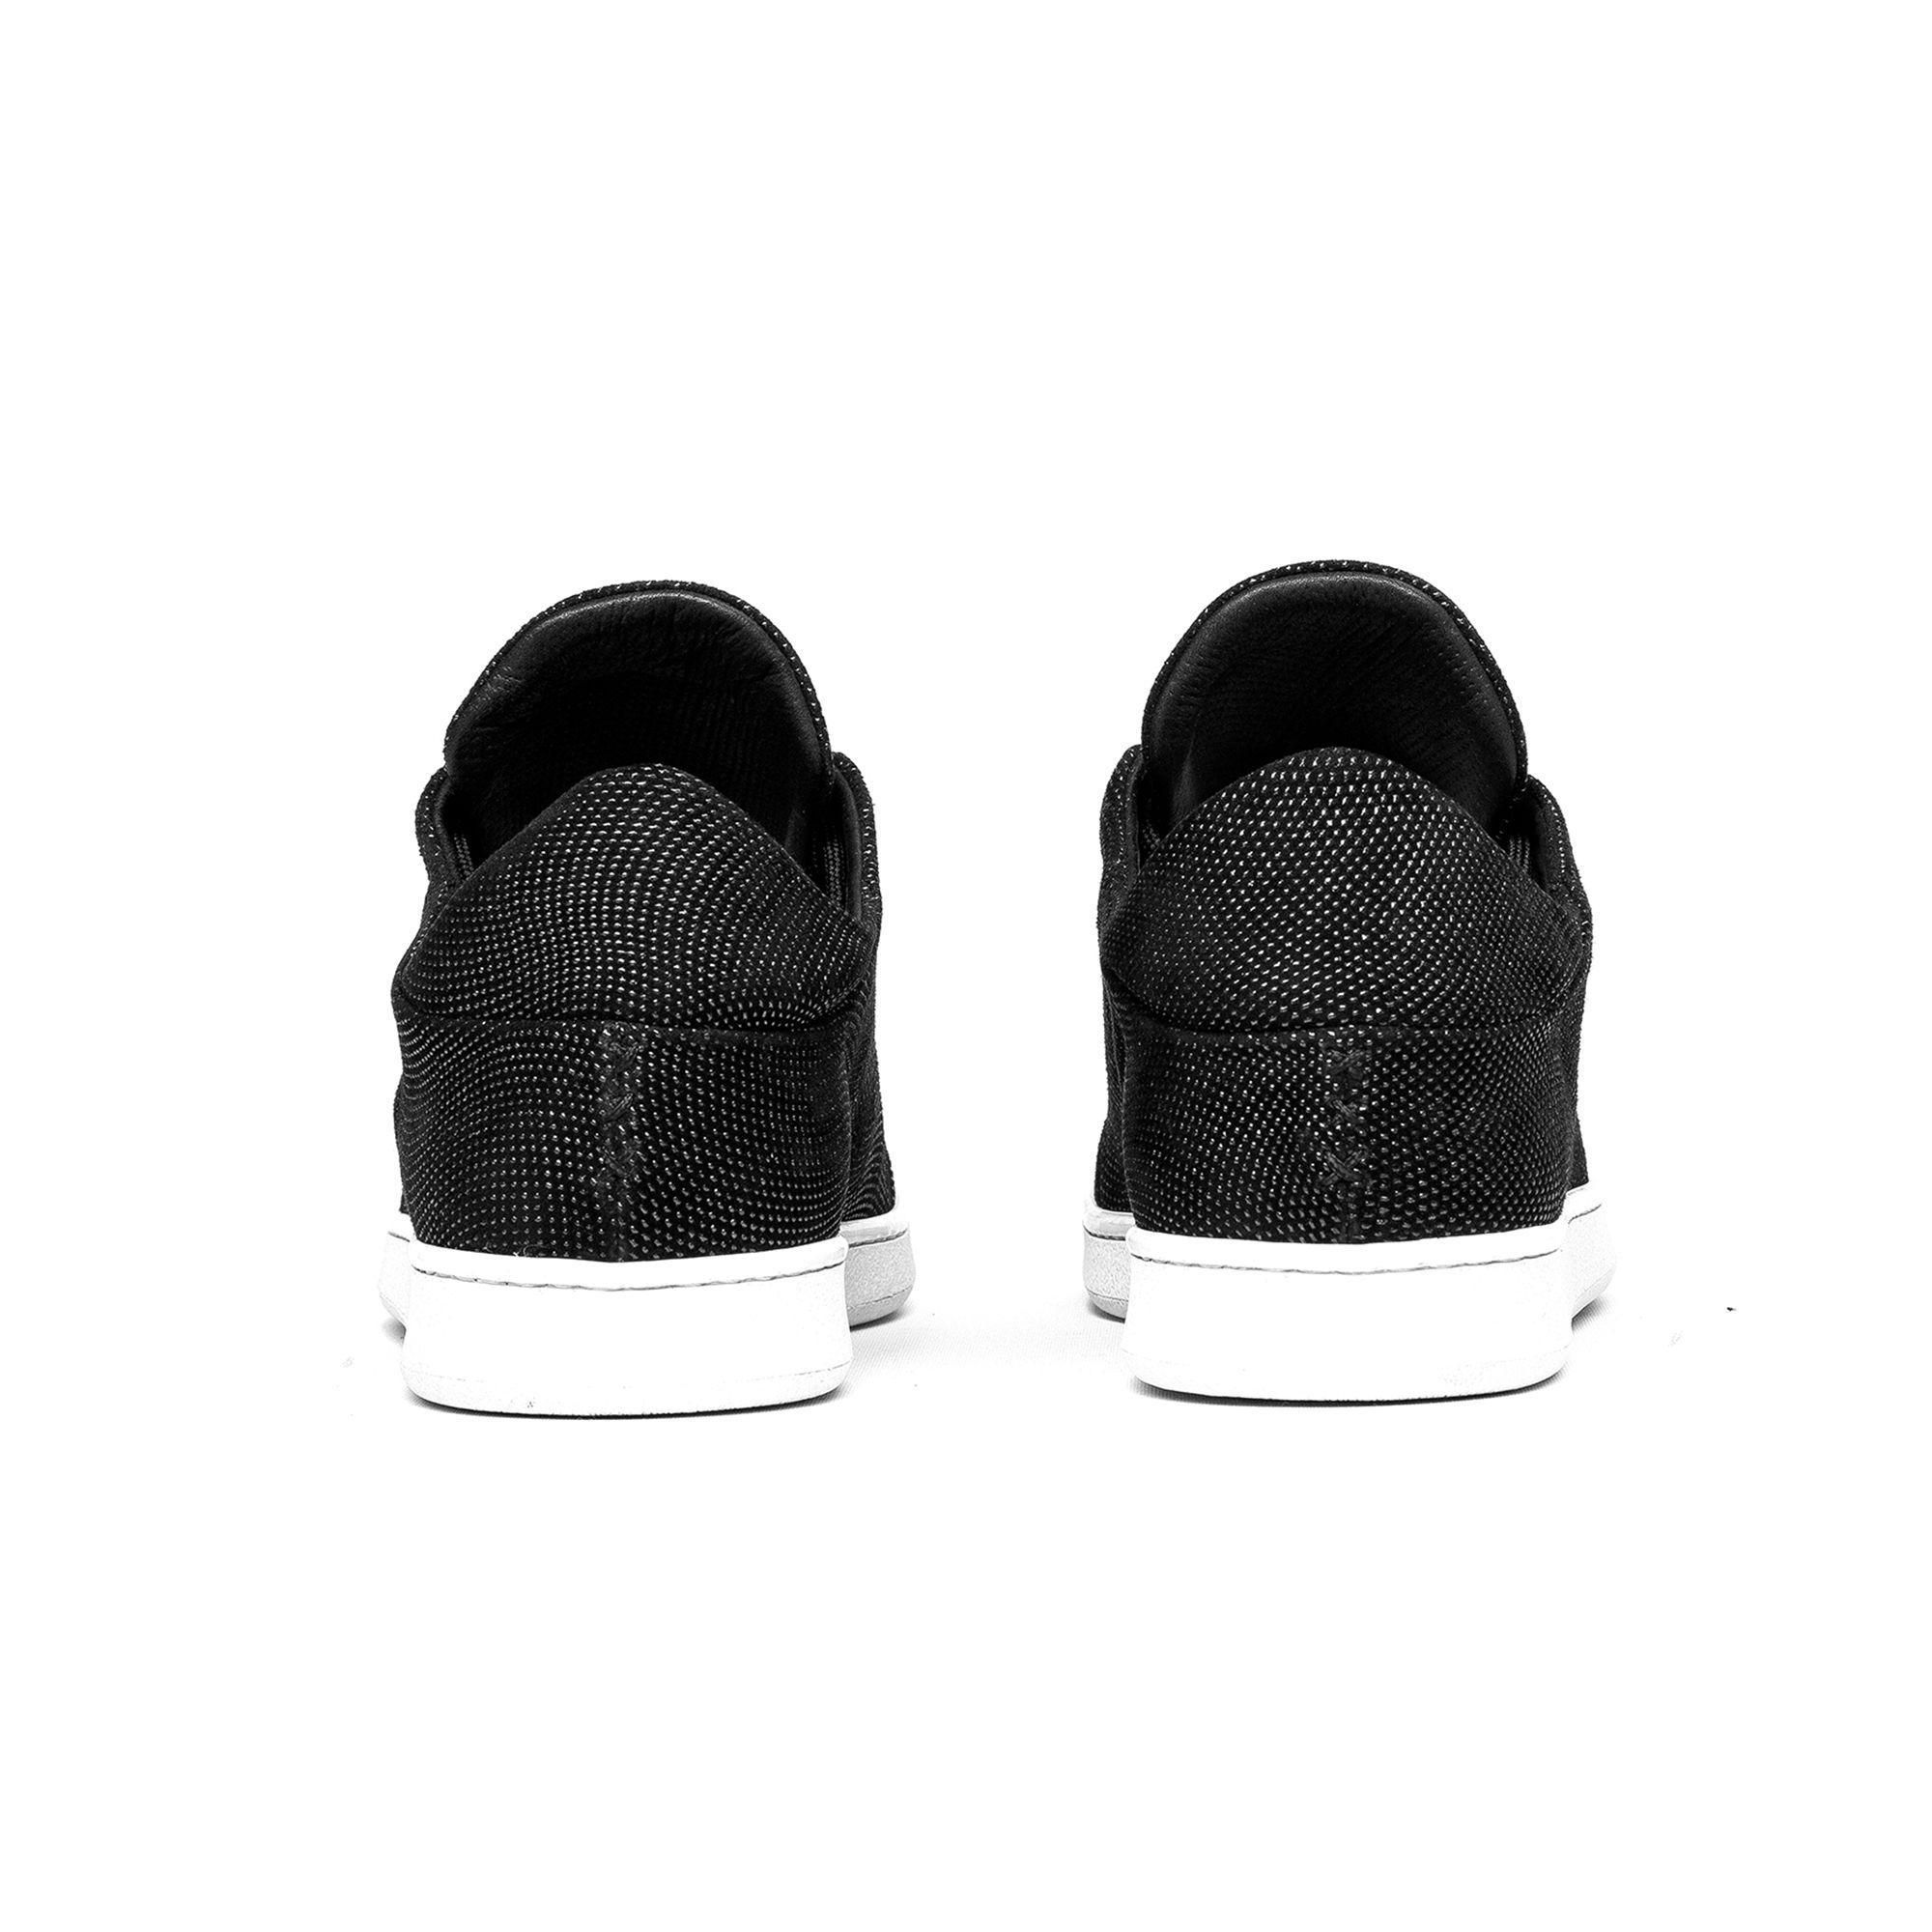 Ylati Footwear Virgilio Low Black Vortex